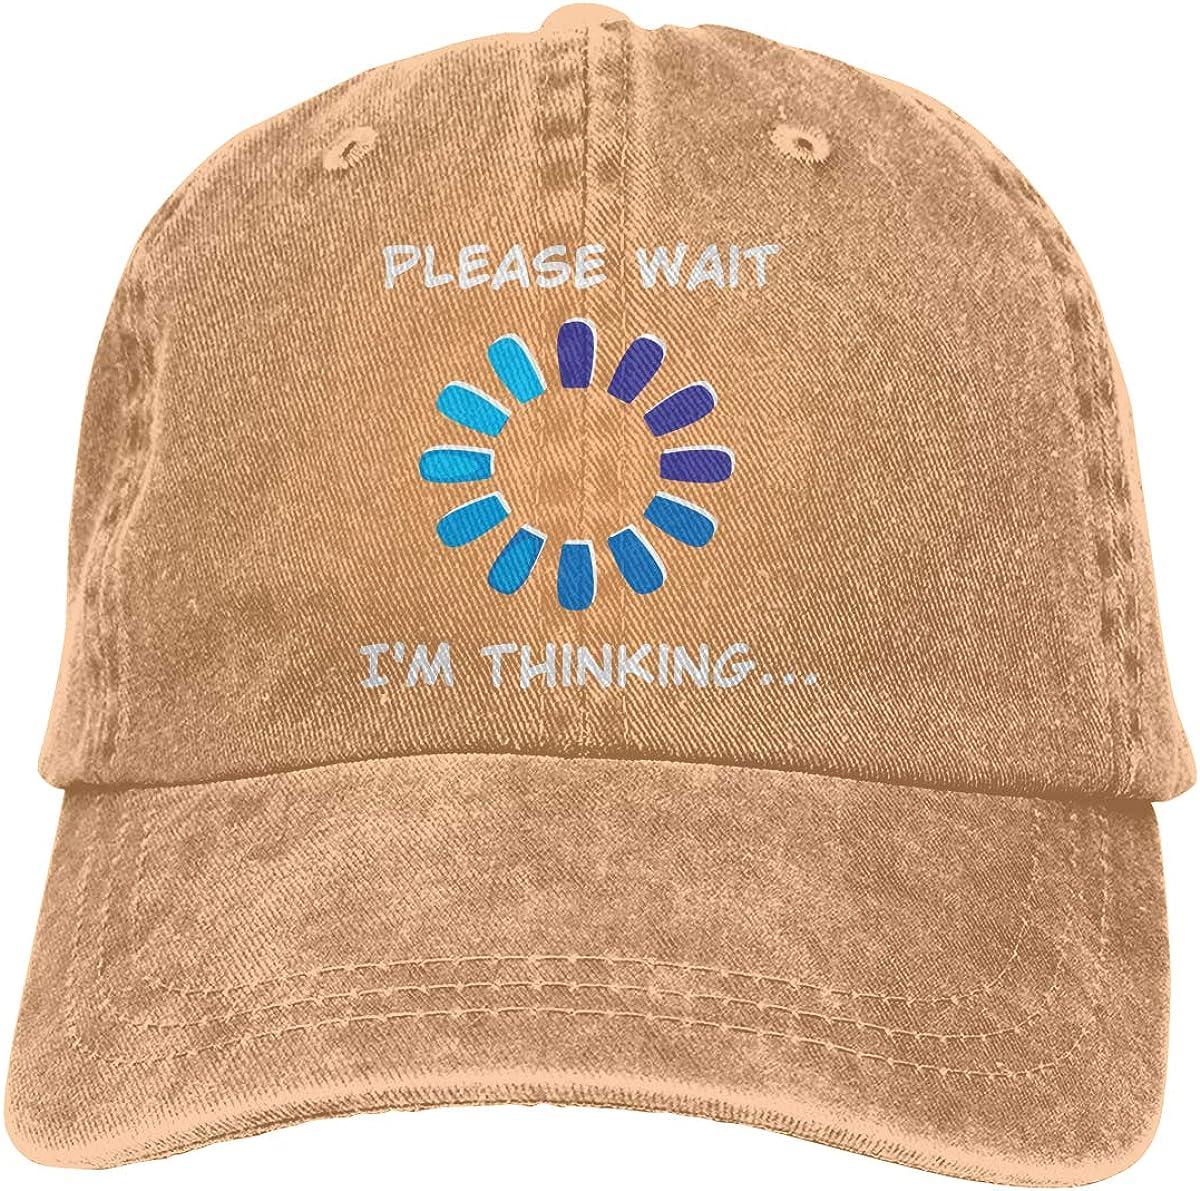 I Am Thinking Adult Custom Cowboy Outdoor Sports Hat Adjustable Baseball Cap